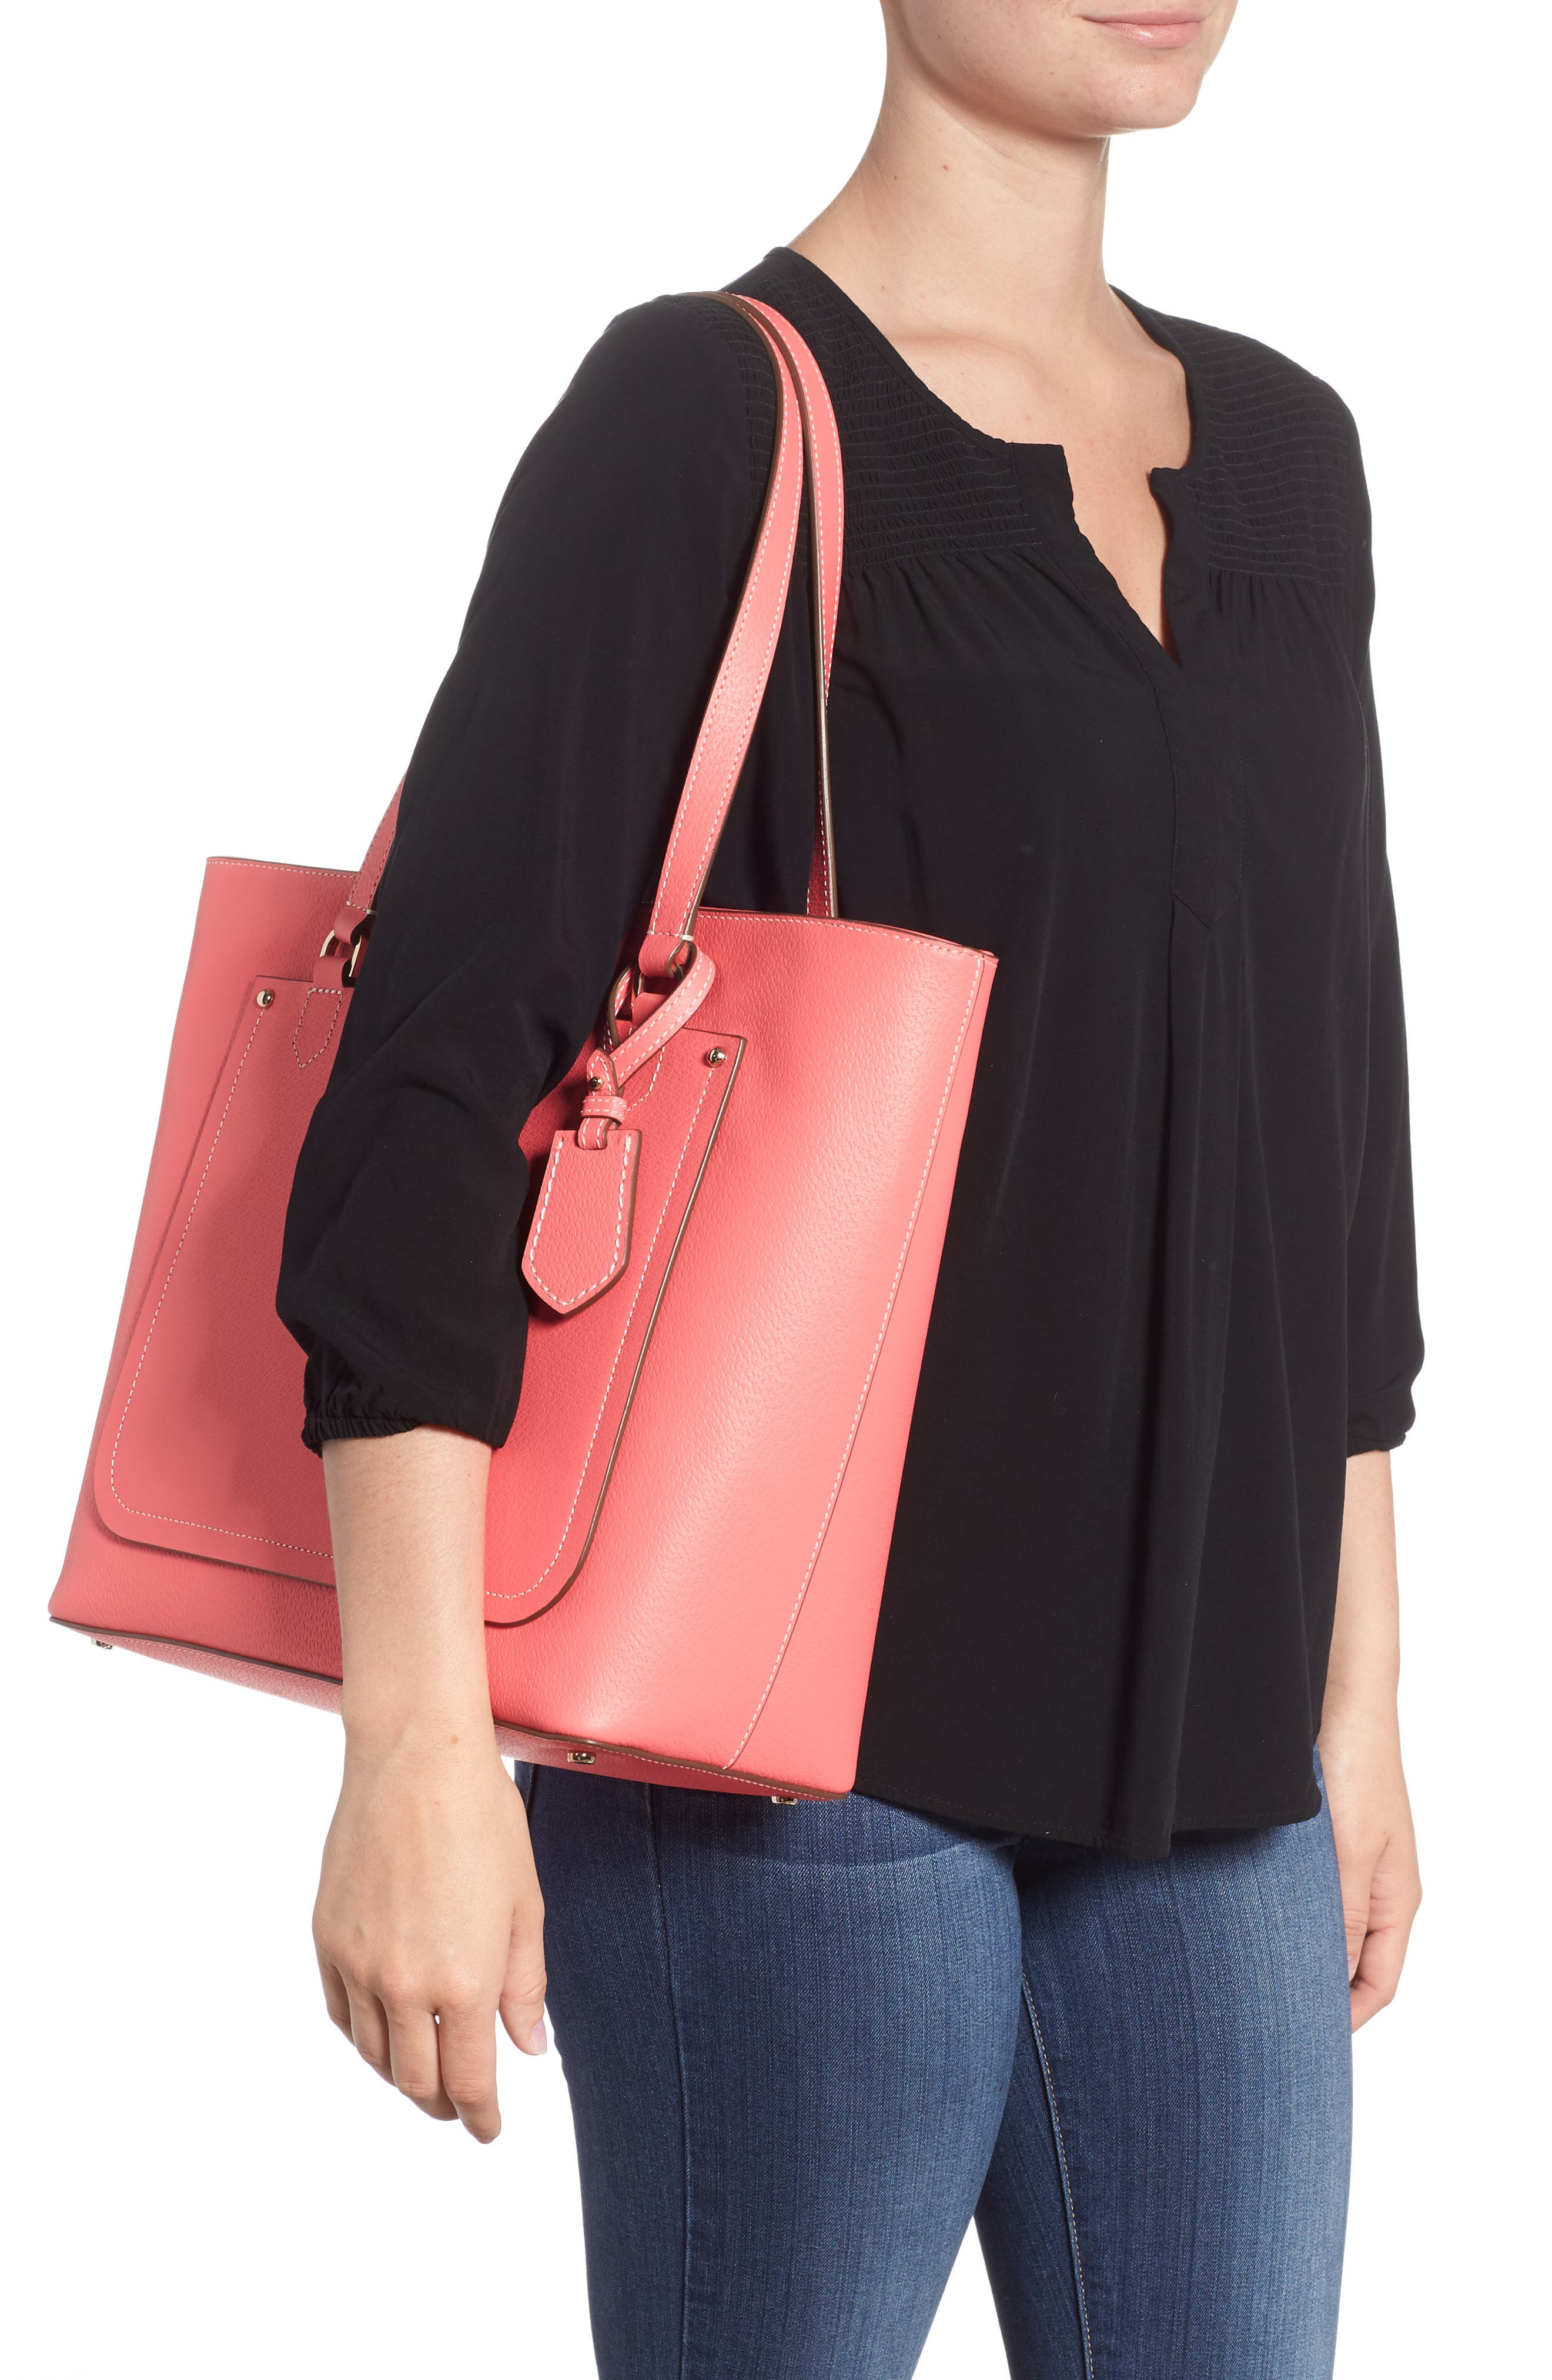 thompson street - kimberly leather tote,                             Alternate thumbnail 2, color,                             Bright Flamingo